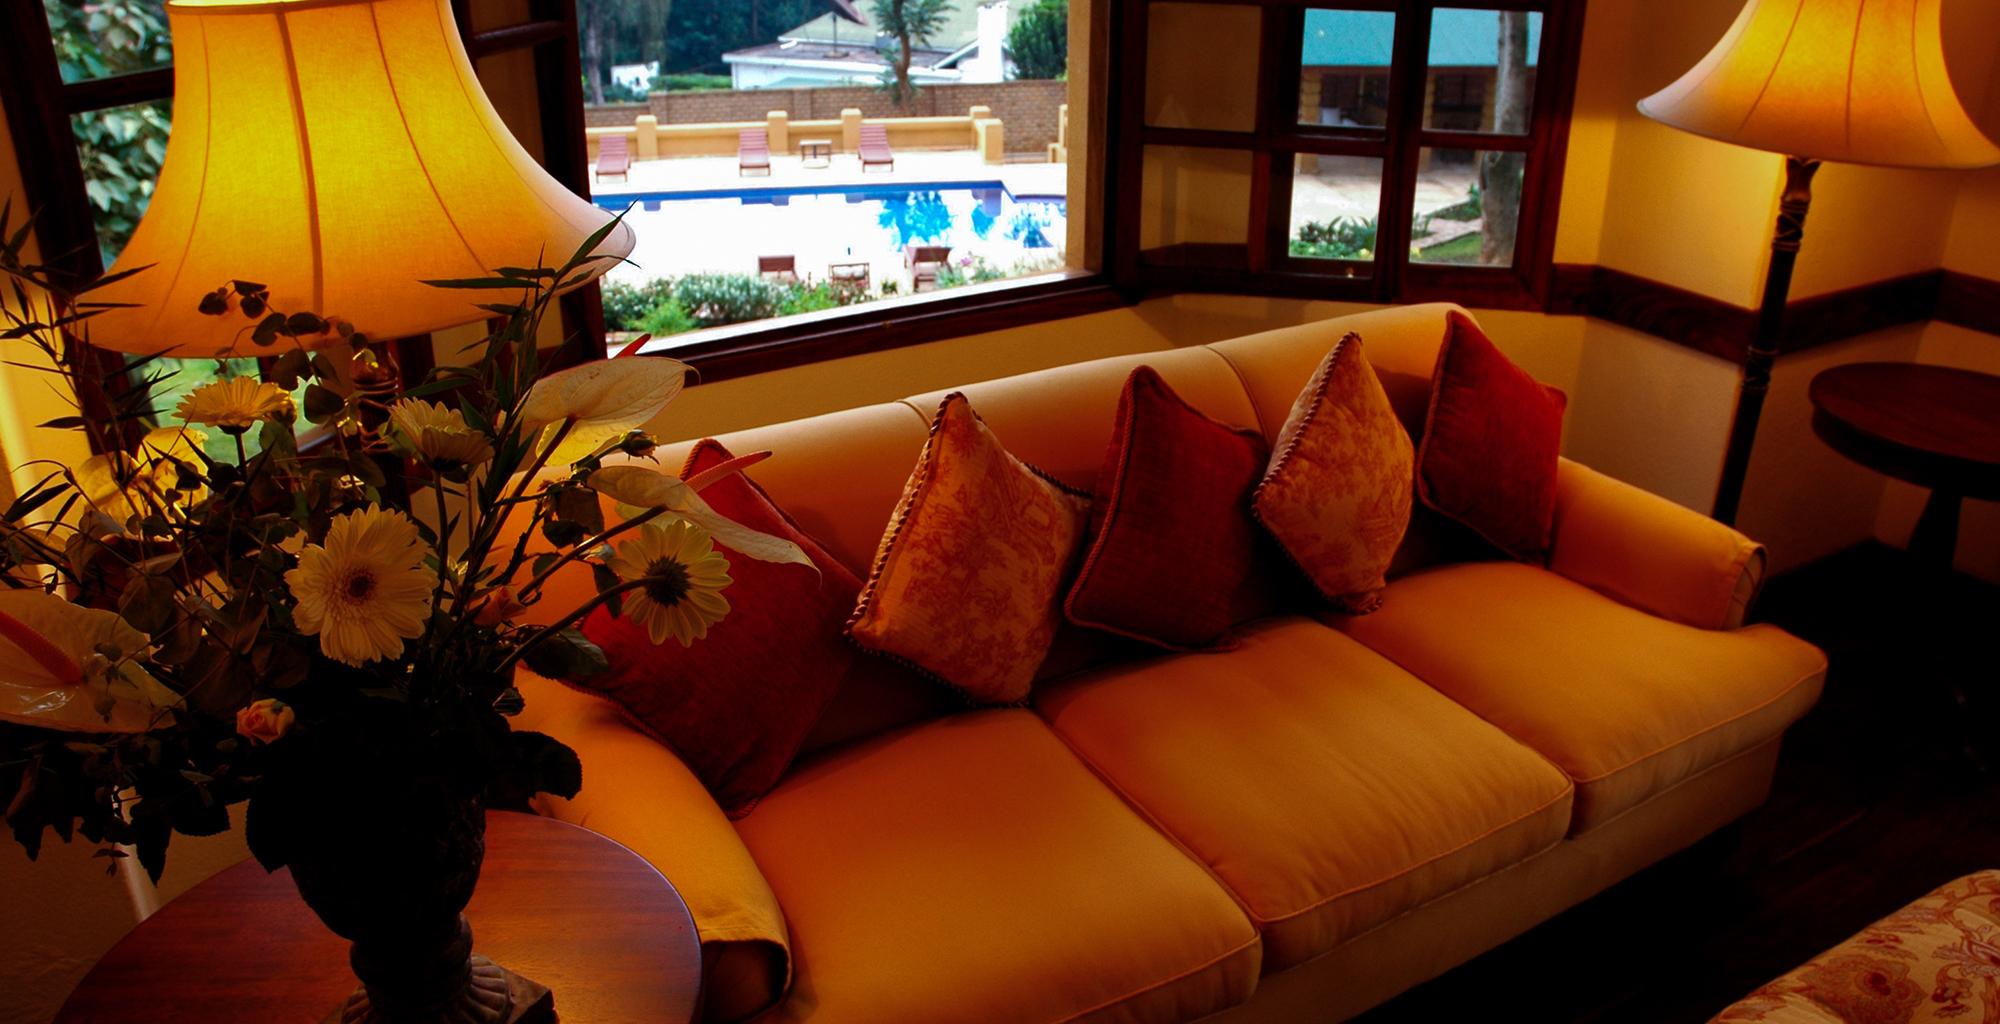 Uganda-Emin-Pasha-Pool-Lounge